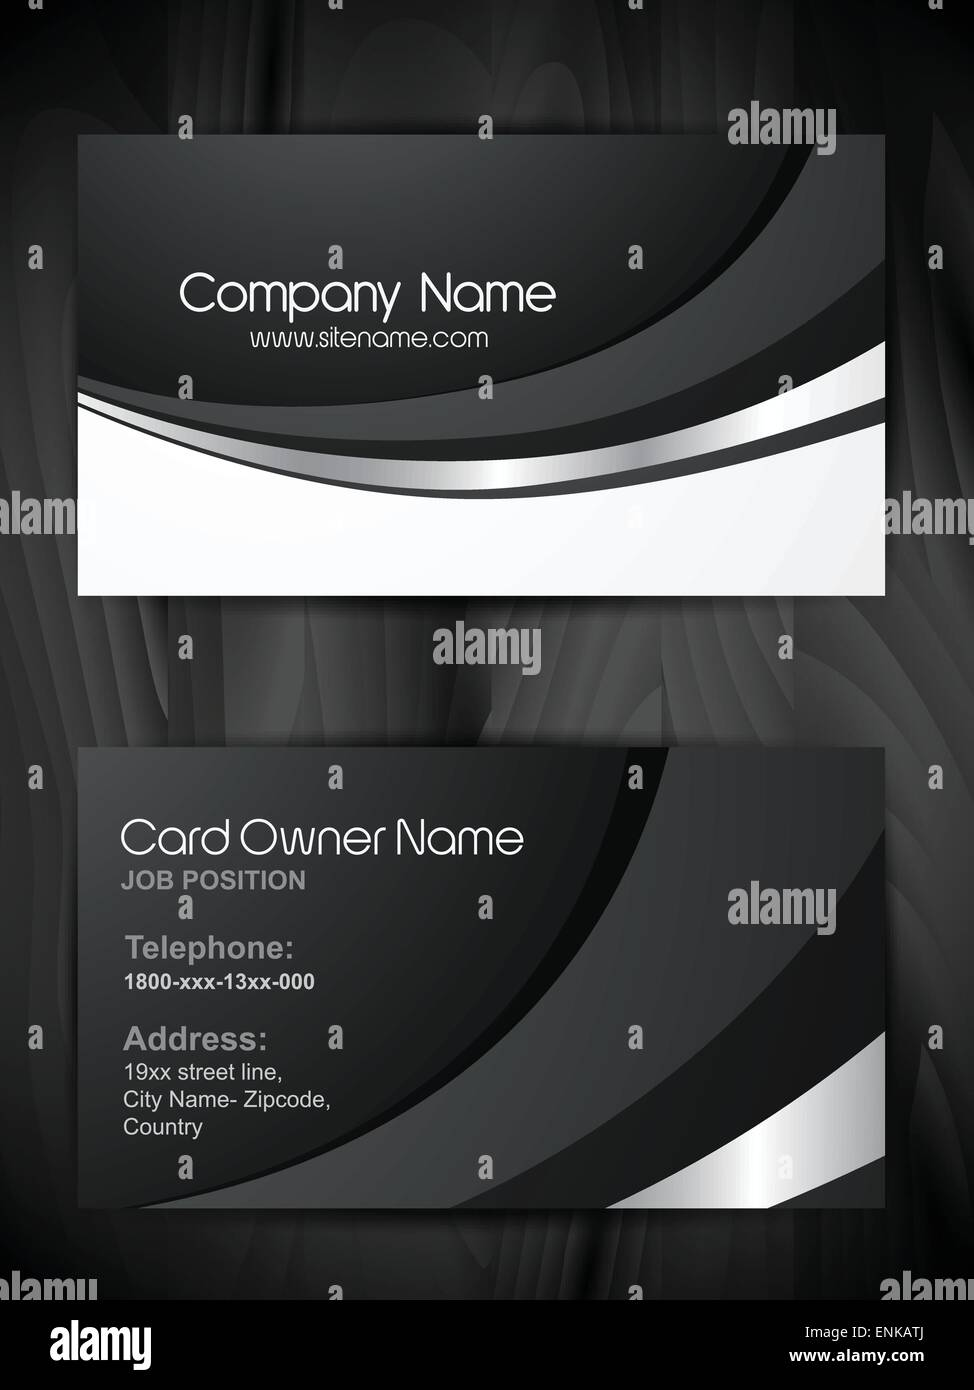 Shiny business card template design stock vector art illustration shiny business card template design colourmoves